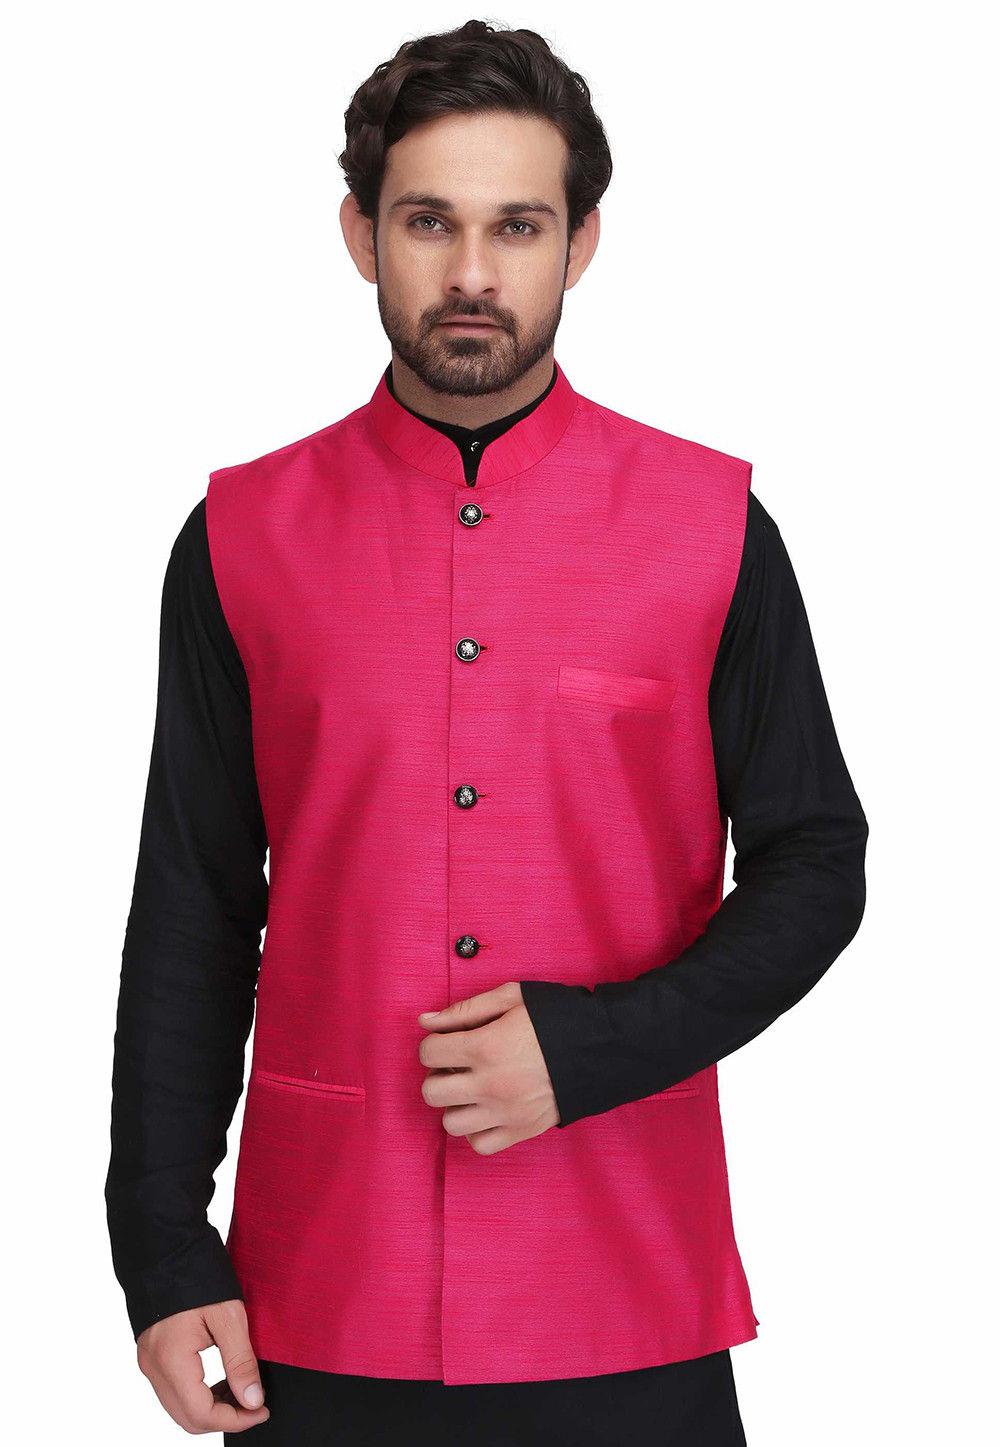 Solid Color Dupion Silk Nehru Jacket in Fuchsia